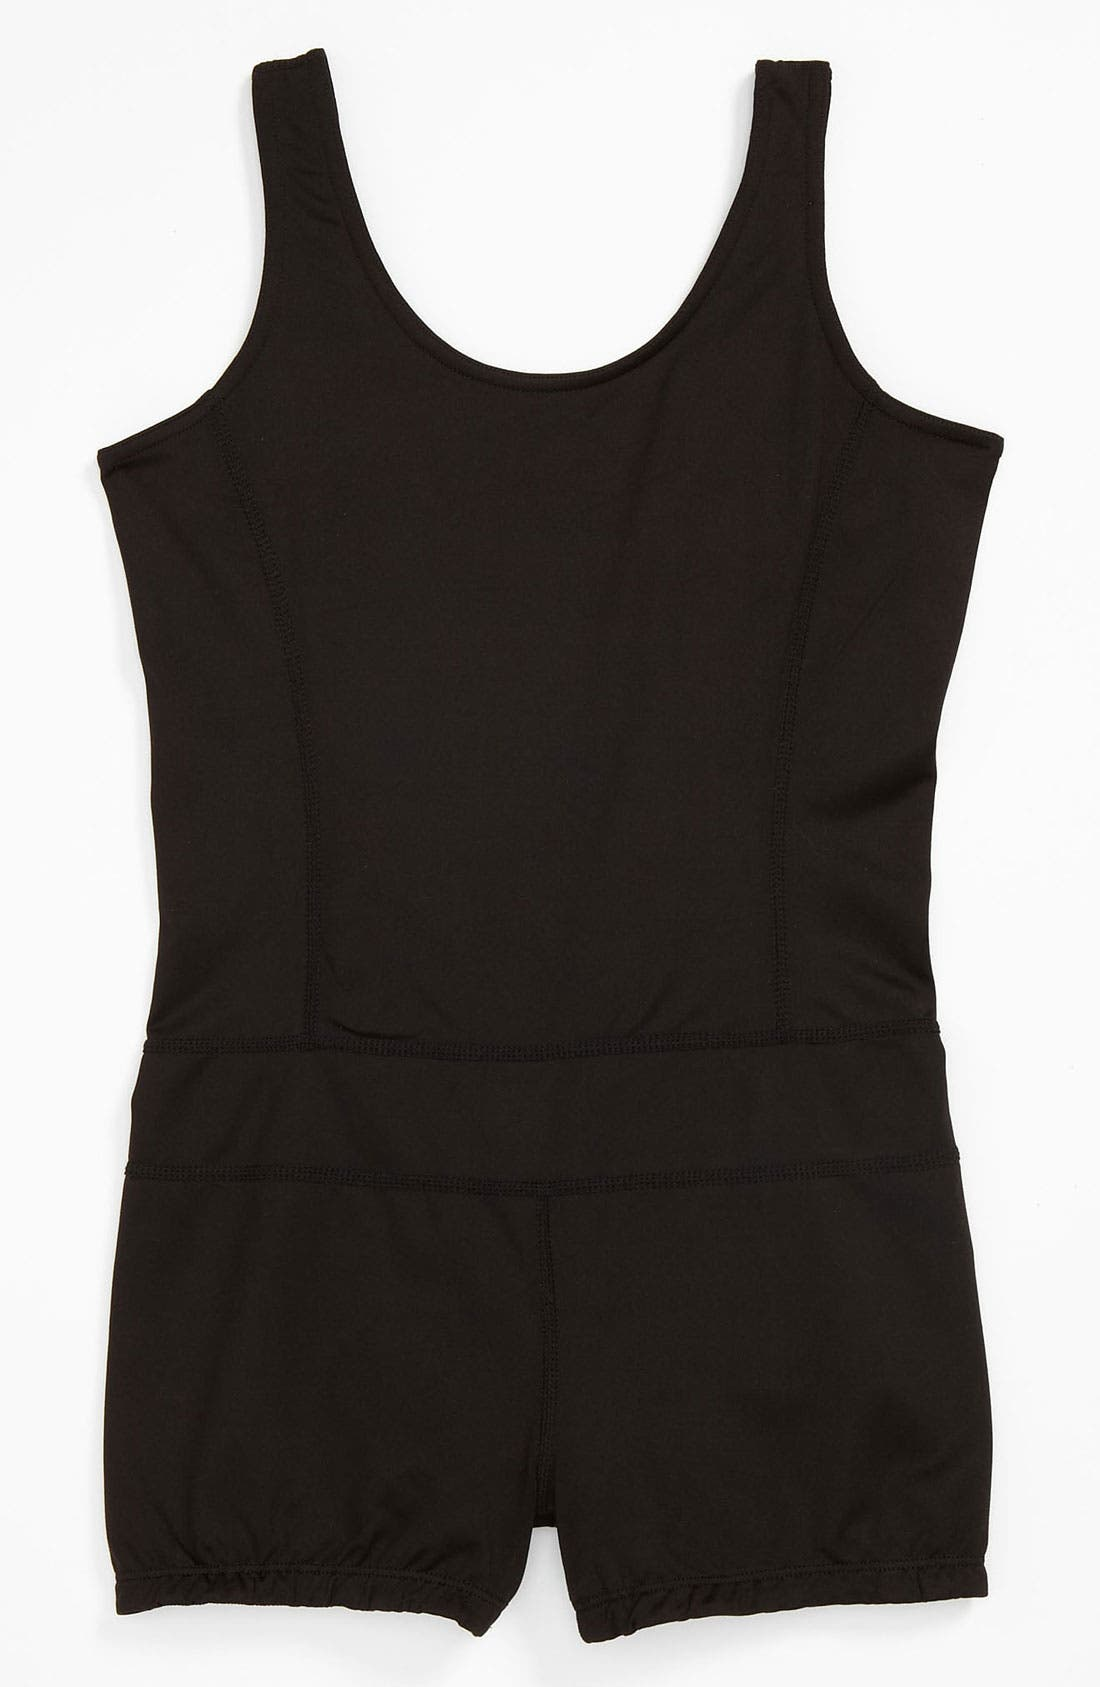 Main Image - Limeapple Gym Short Suit (Little Girls & Big Girls)